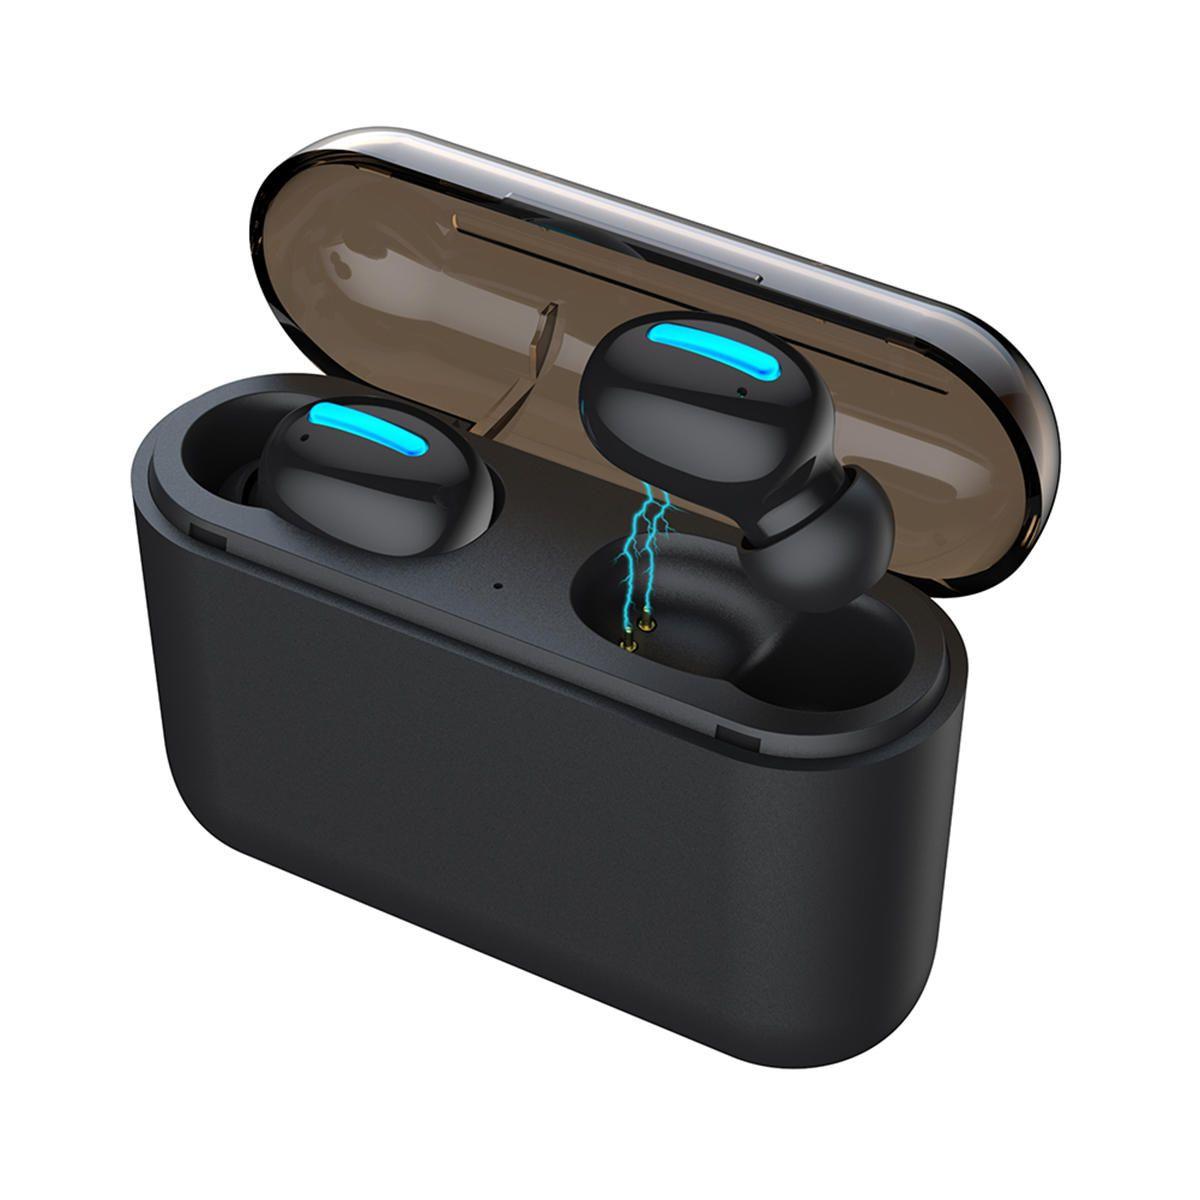 Q32 Stereo bluetooth 5.0 TWS Headphone IPX5 Waterproof True Wireless Earphone With 2600mAh Power Bank Charging Case